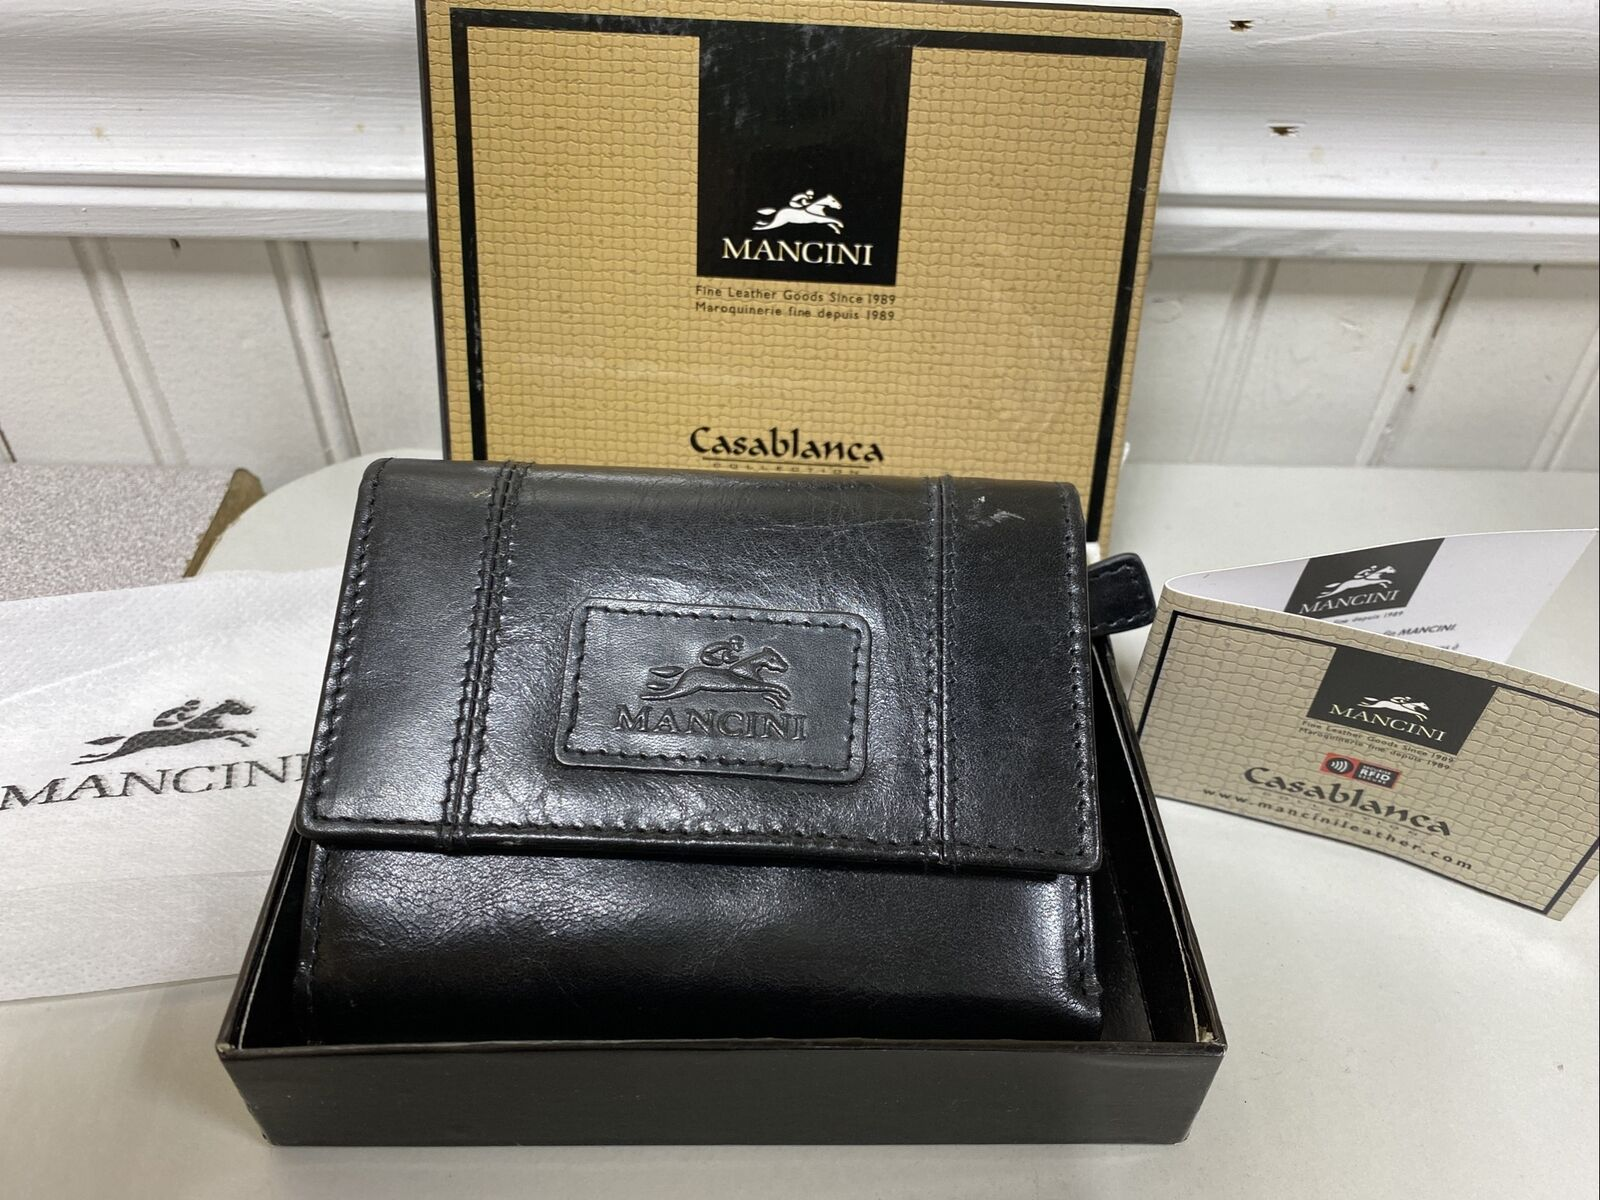 MANCINI Casablanca Collection Black Leather Wallet Tri-Fold, RFID, NEW